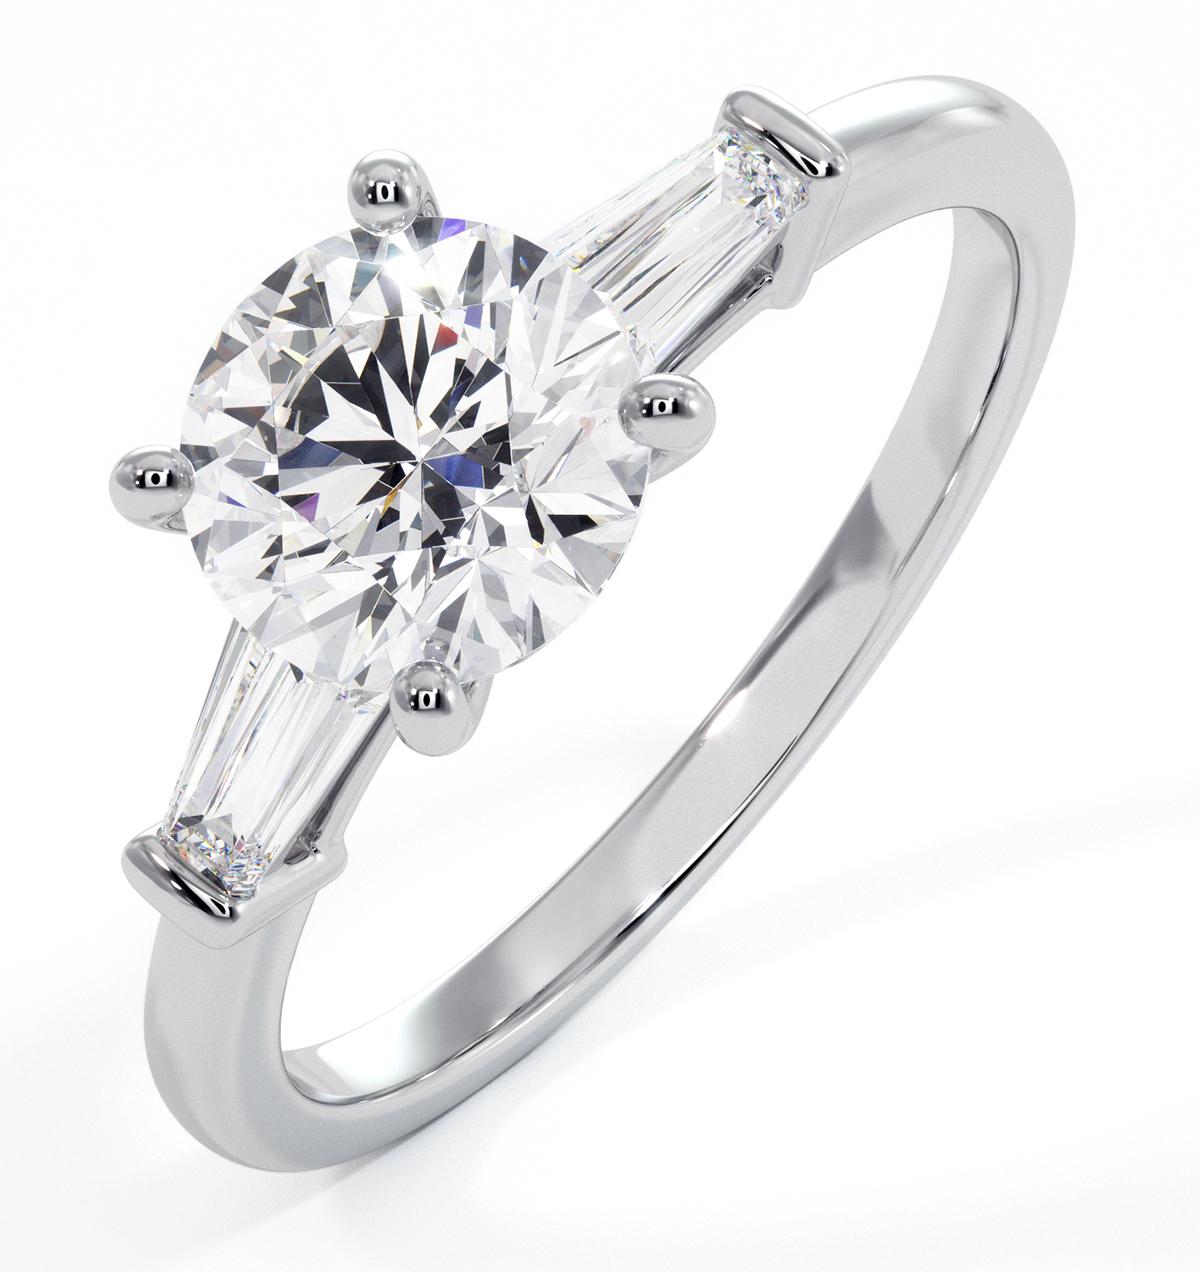 Isadora GIA Diamond Engagement Ring 18KW 1.25ct G/SI2 - image 1